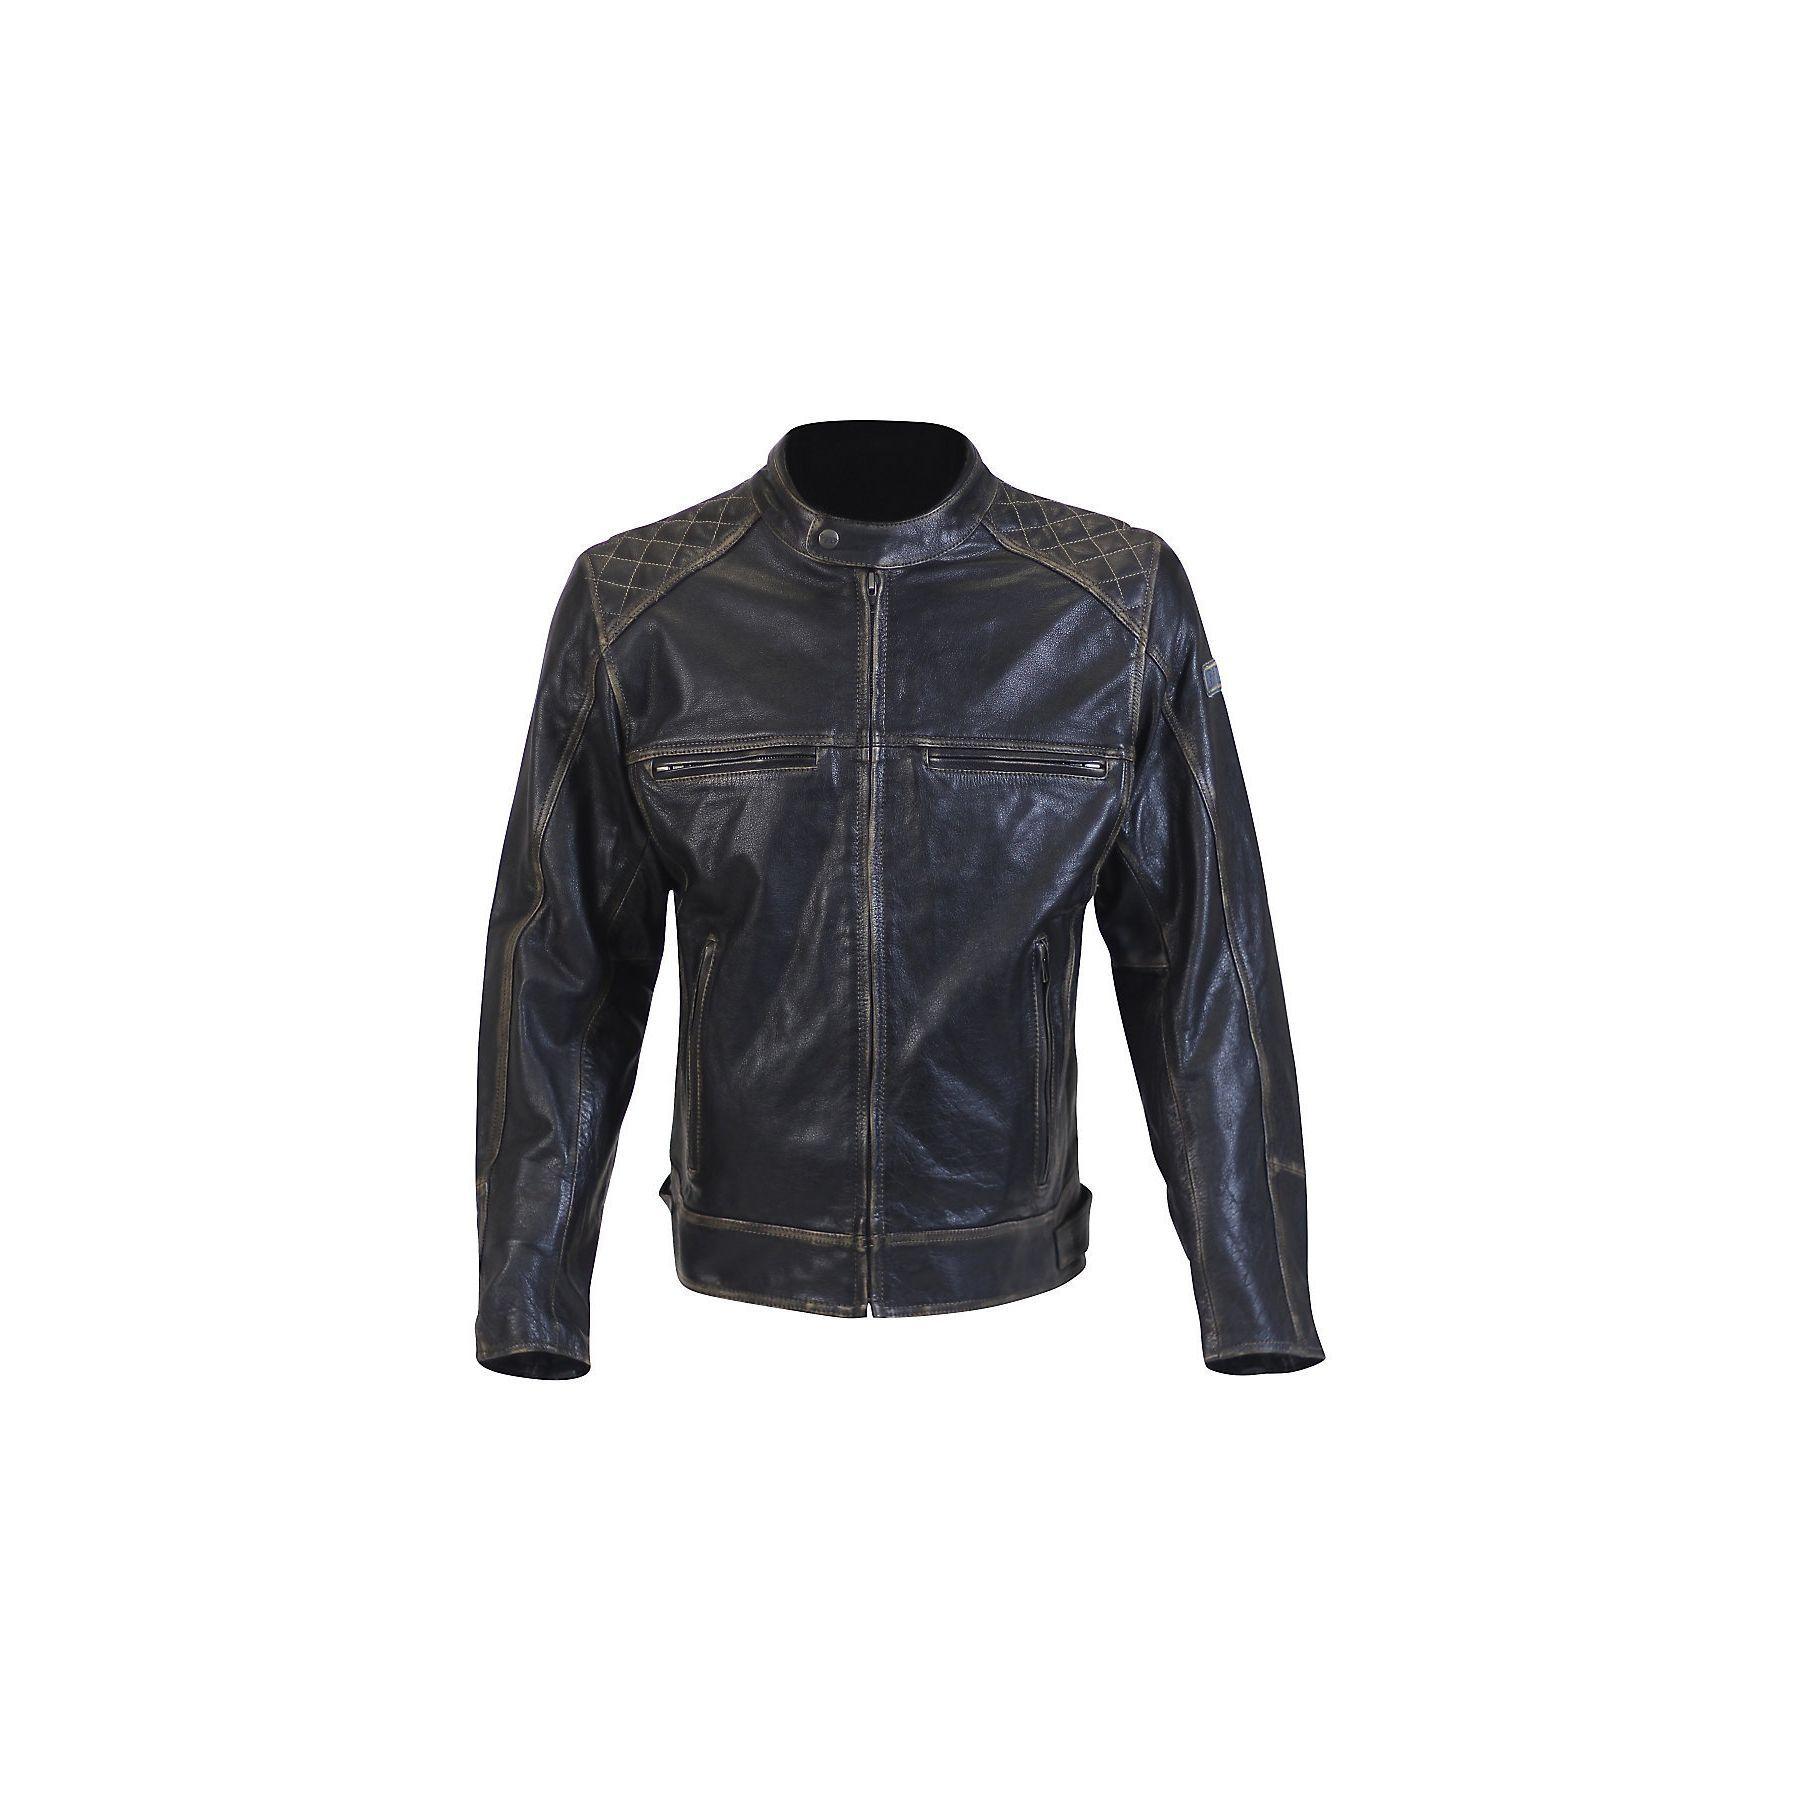 Custom Bilt Hudson Jacket Cycle Gear Street Jacket Jackets Cycle Gear [ 1800 x 1800 Pixel ]